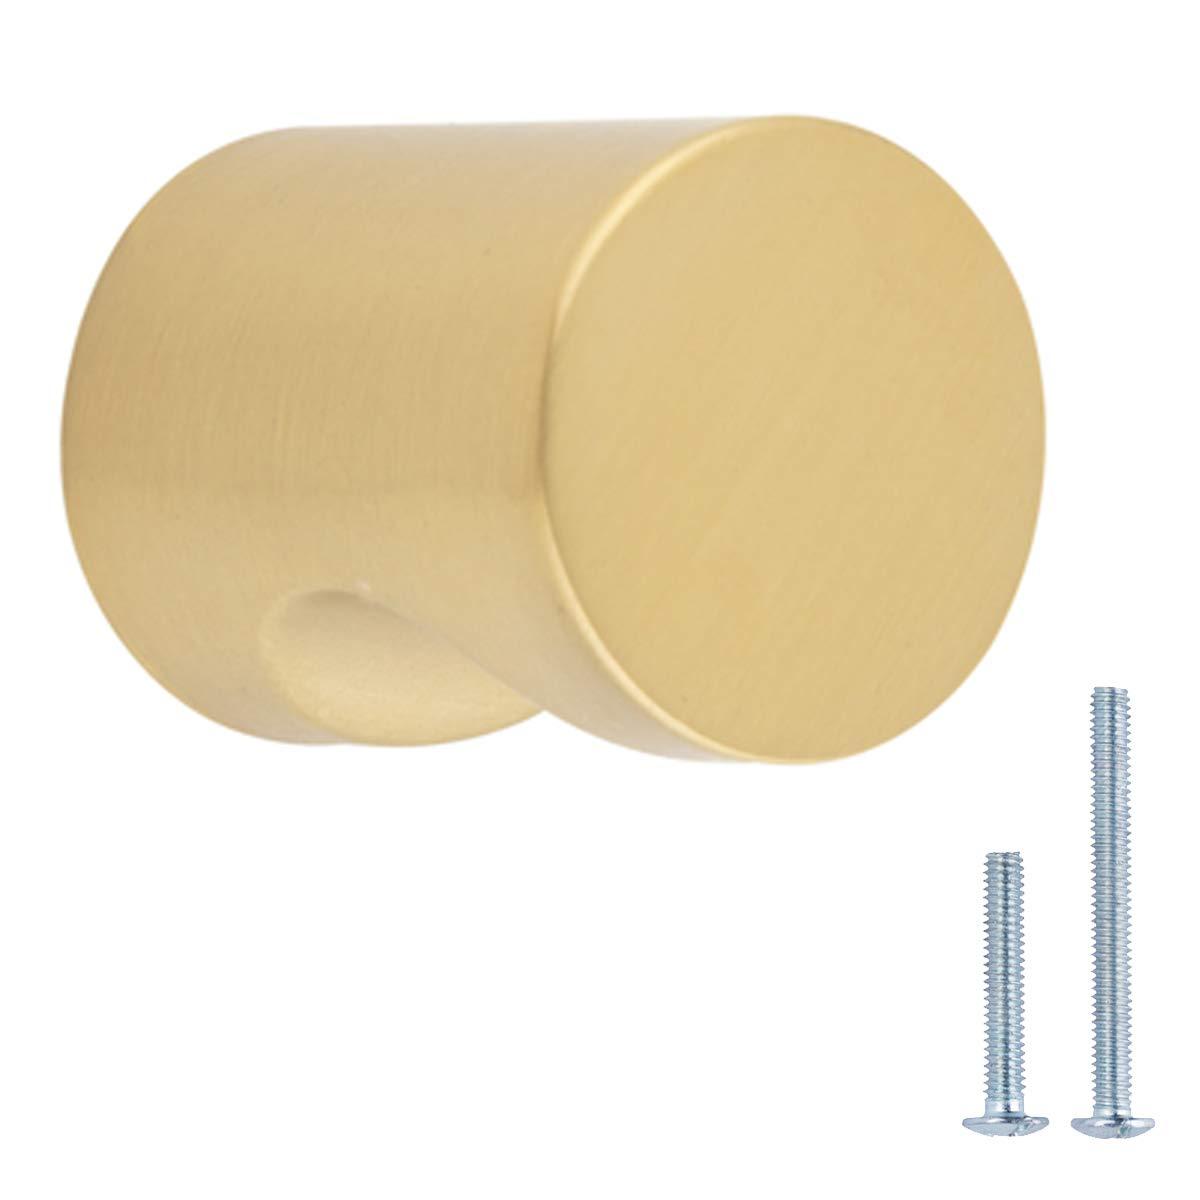 AmazonBasics Whistle Cabinet Knob, 0.75'' Diameter, Golden Champagne, 25-Pack